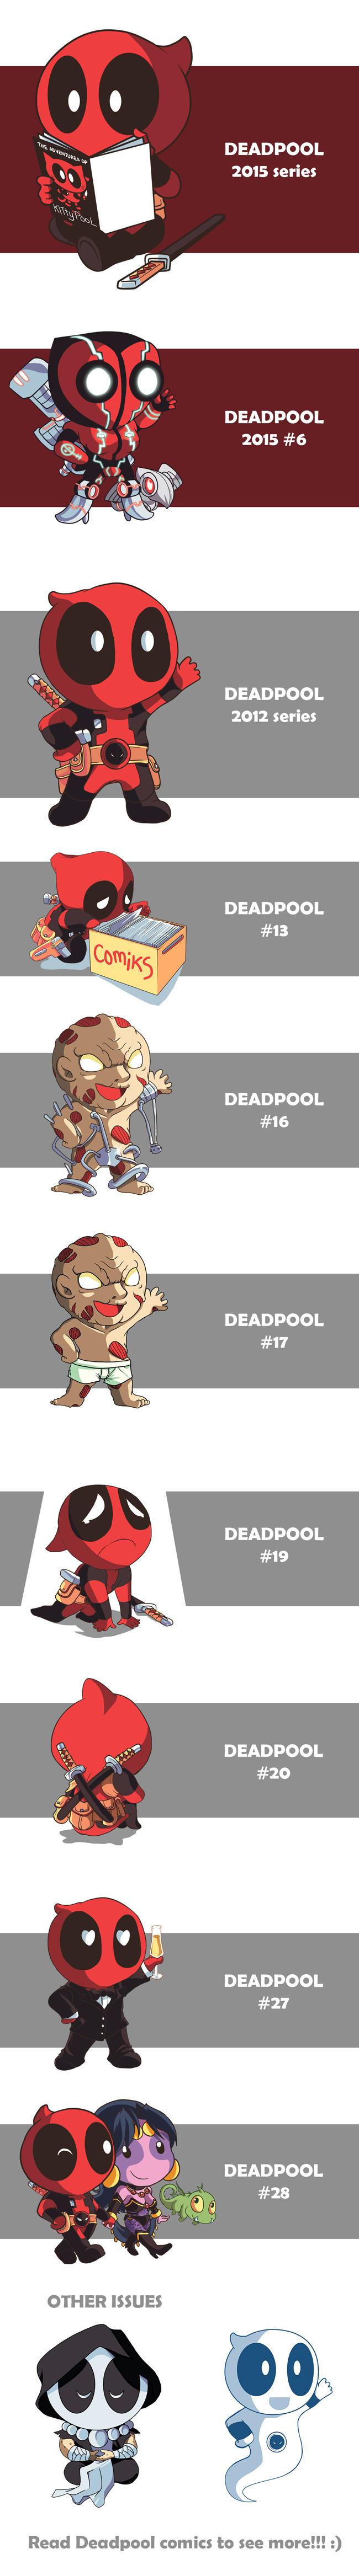 Easy Pikachu Deadpool Kawaii Chibi Drawings Www Galleryneed Com